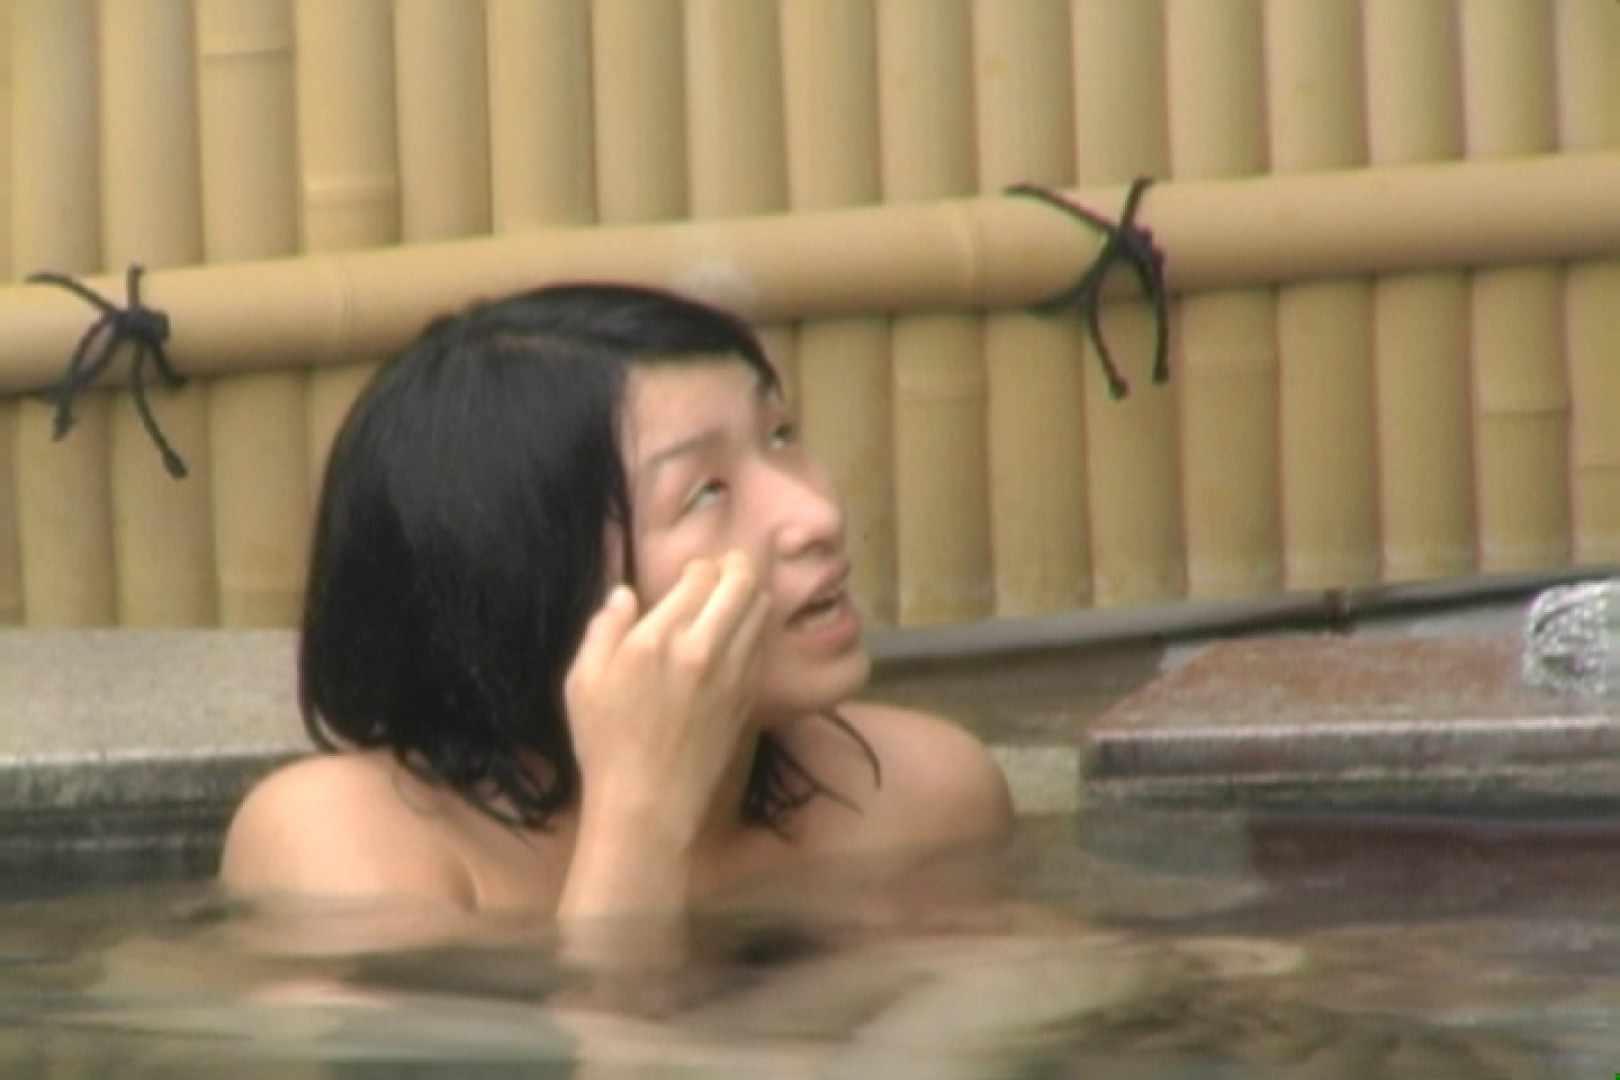 Aquaな露天風呂Vol.618 盗撮映像  104Pix 65